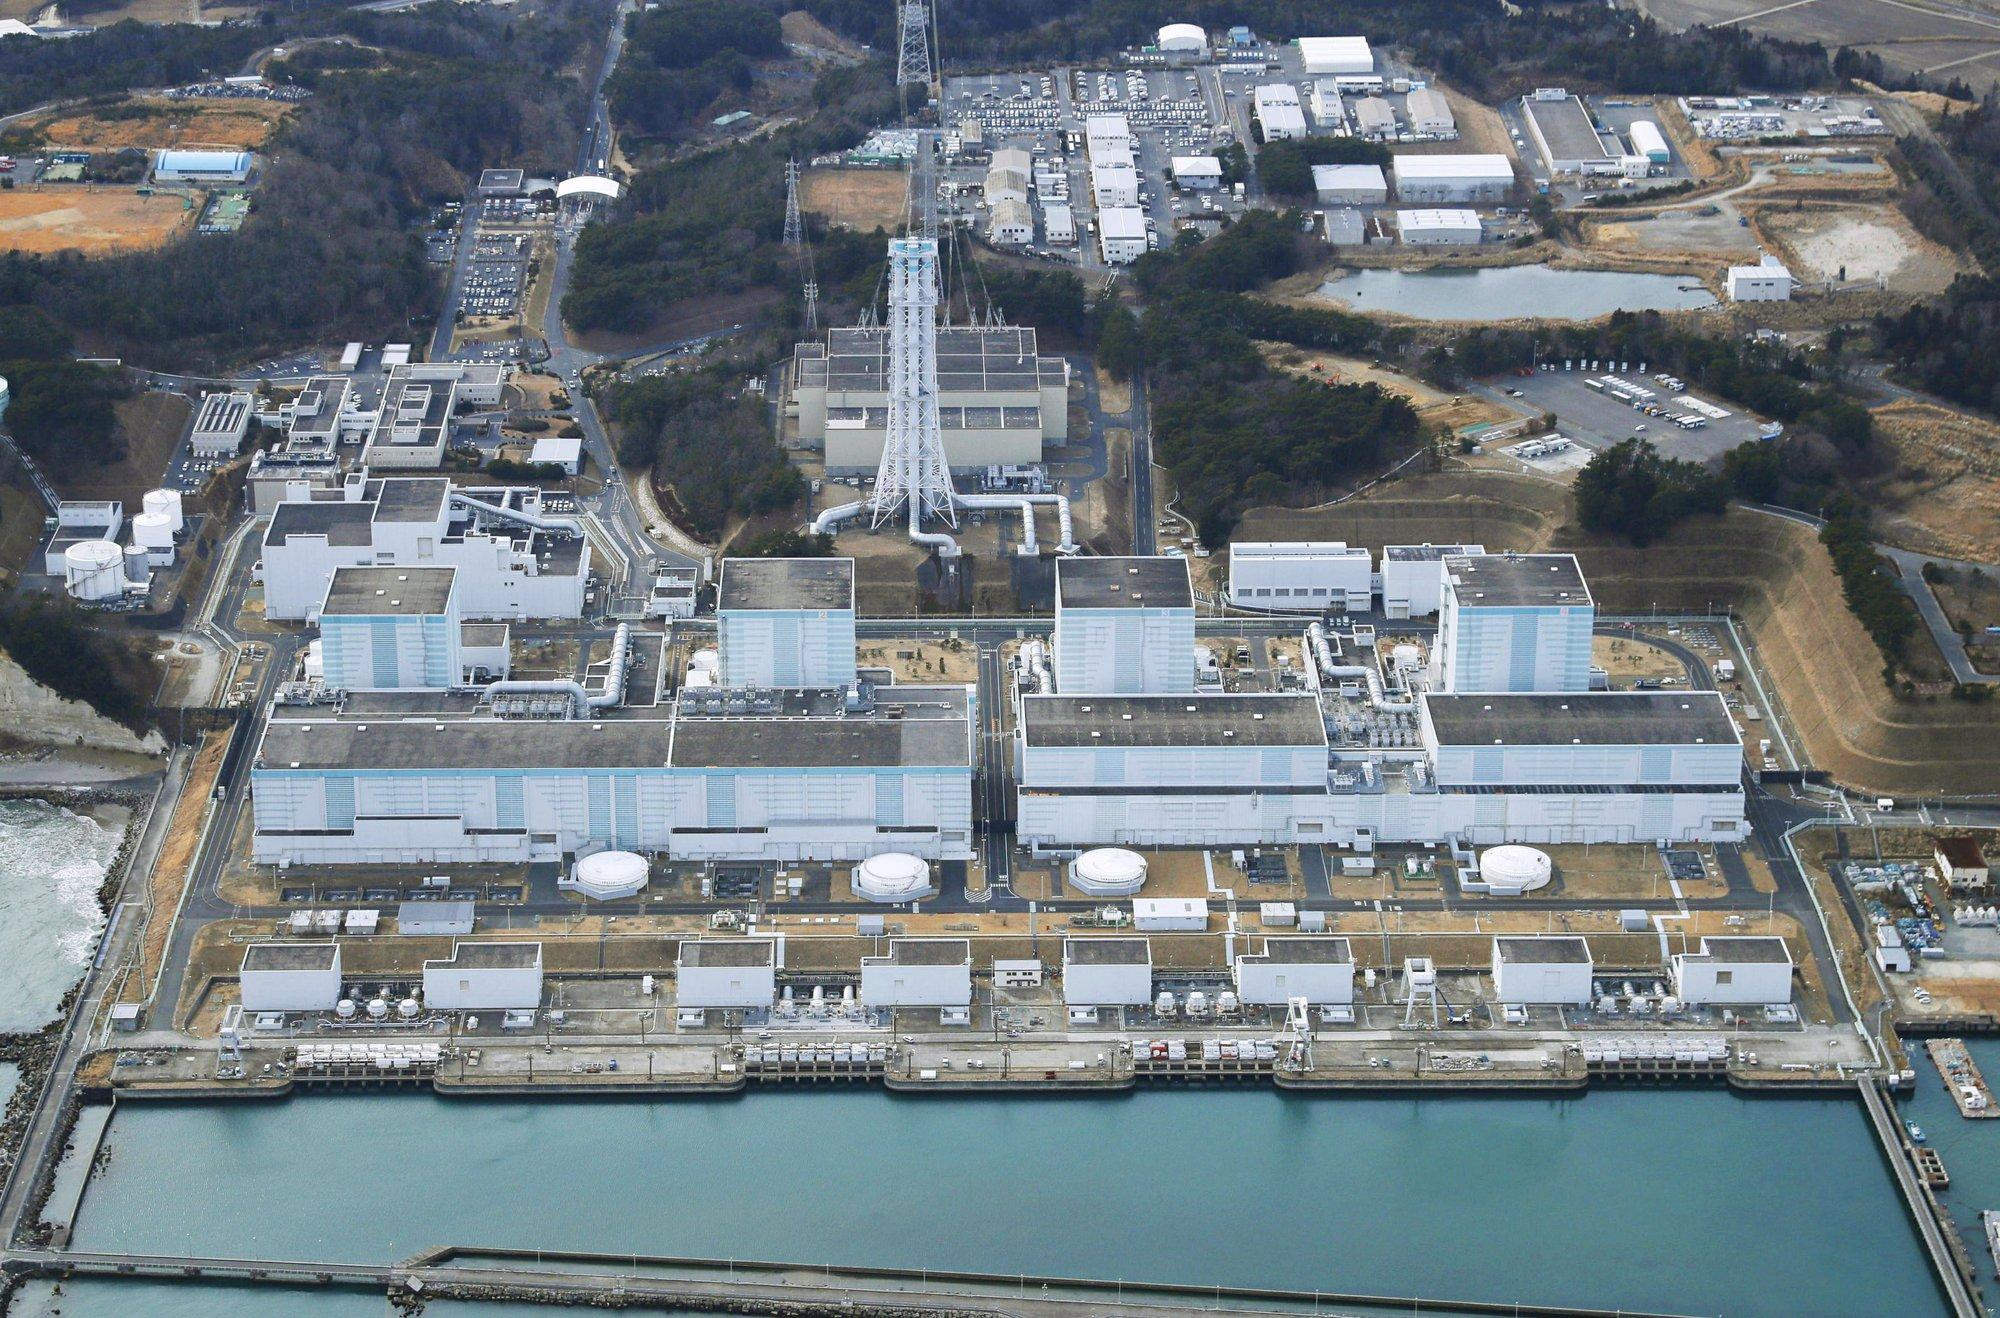 Japanese utility eyes scrapping 2nd Fukushima nuclear plant